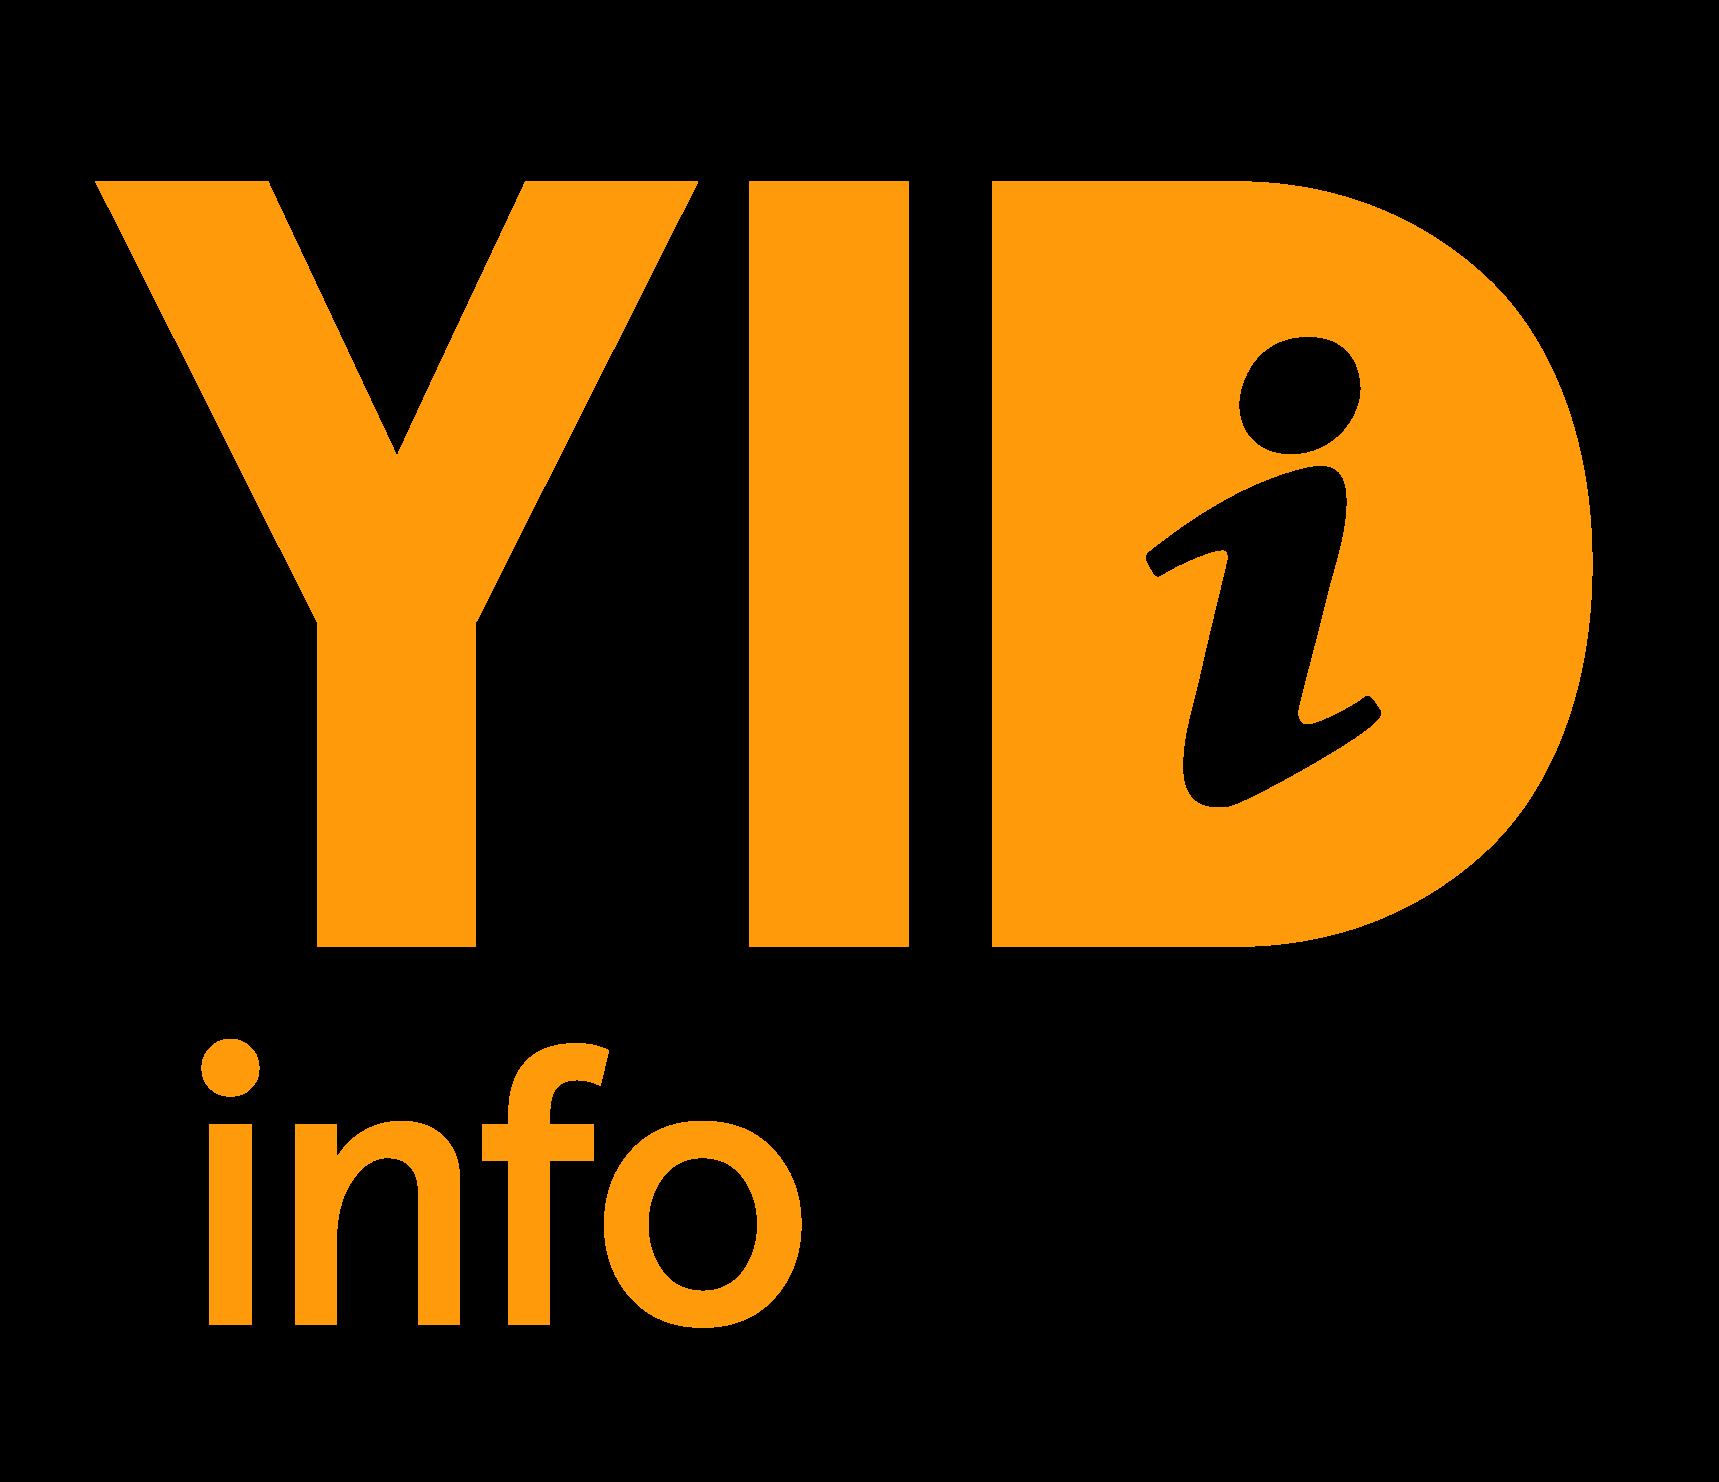 Yid Info